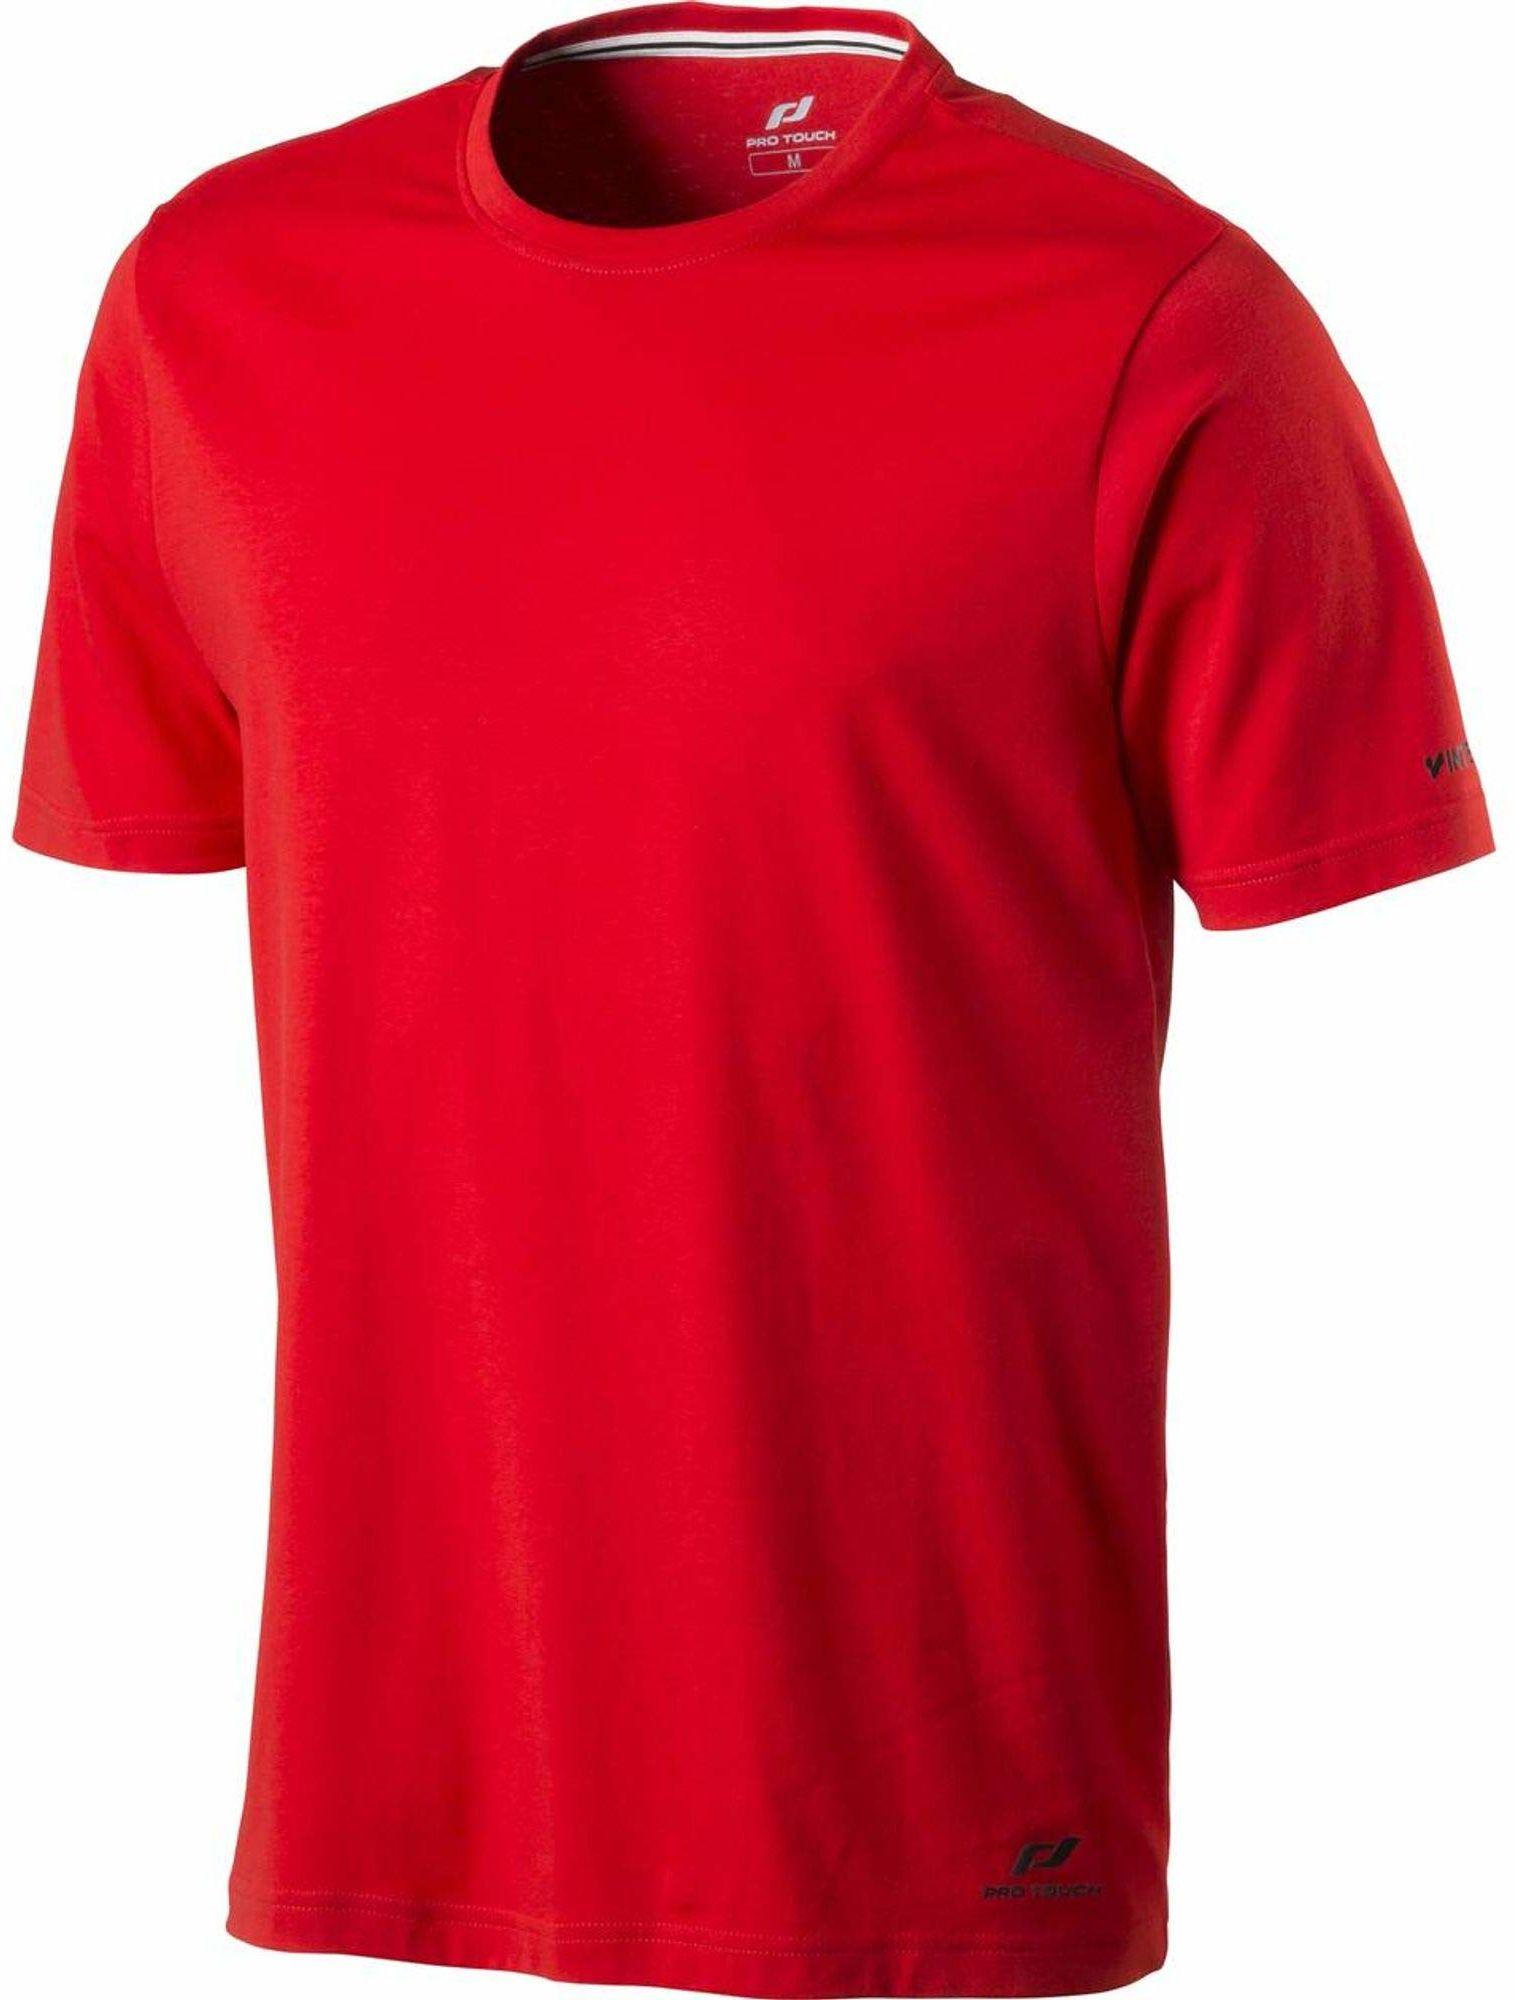 Pro Touch Promo męska koszulka, czerwona, L